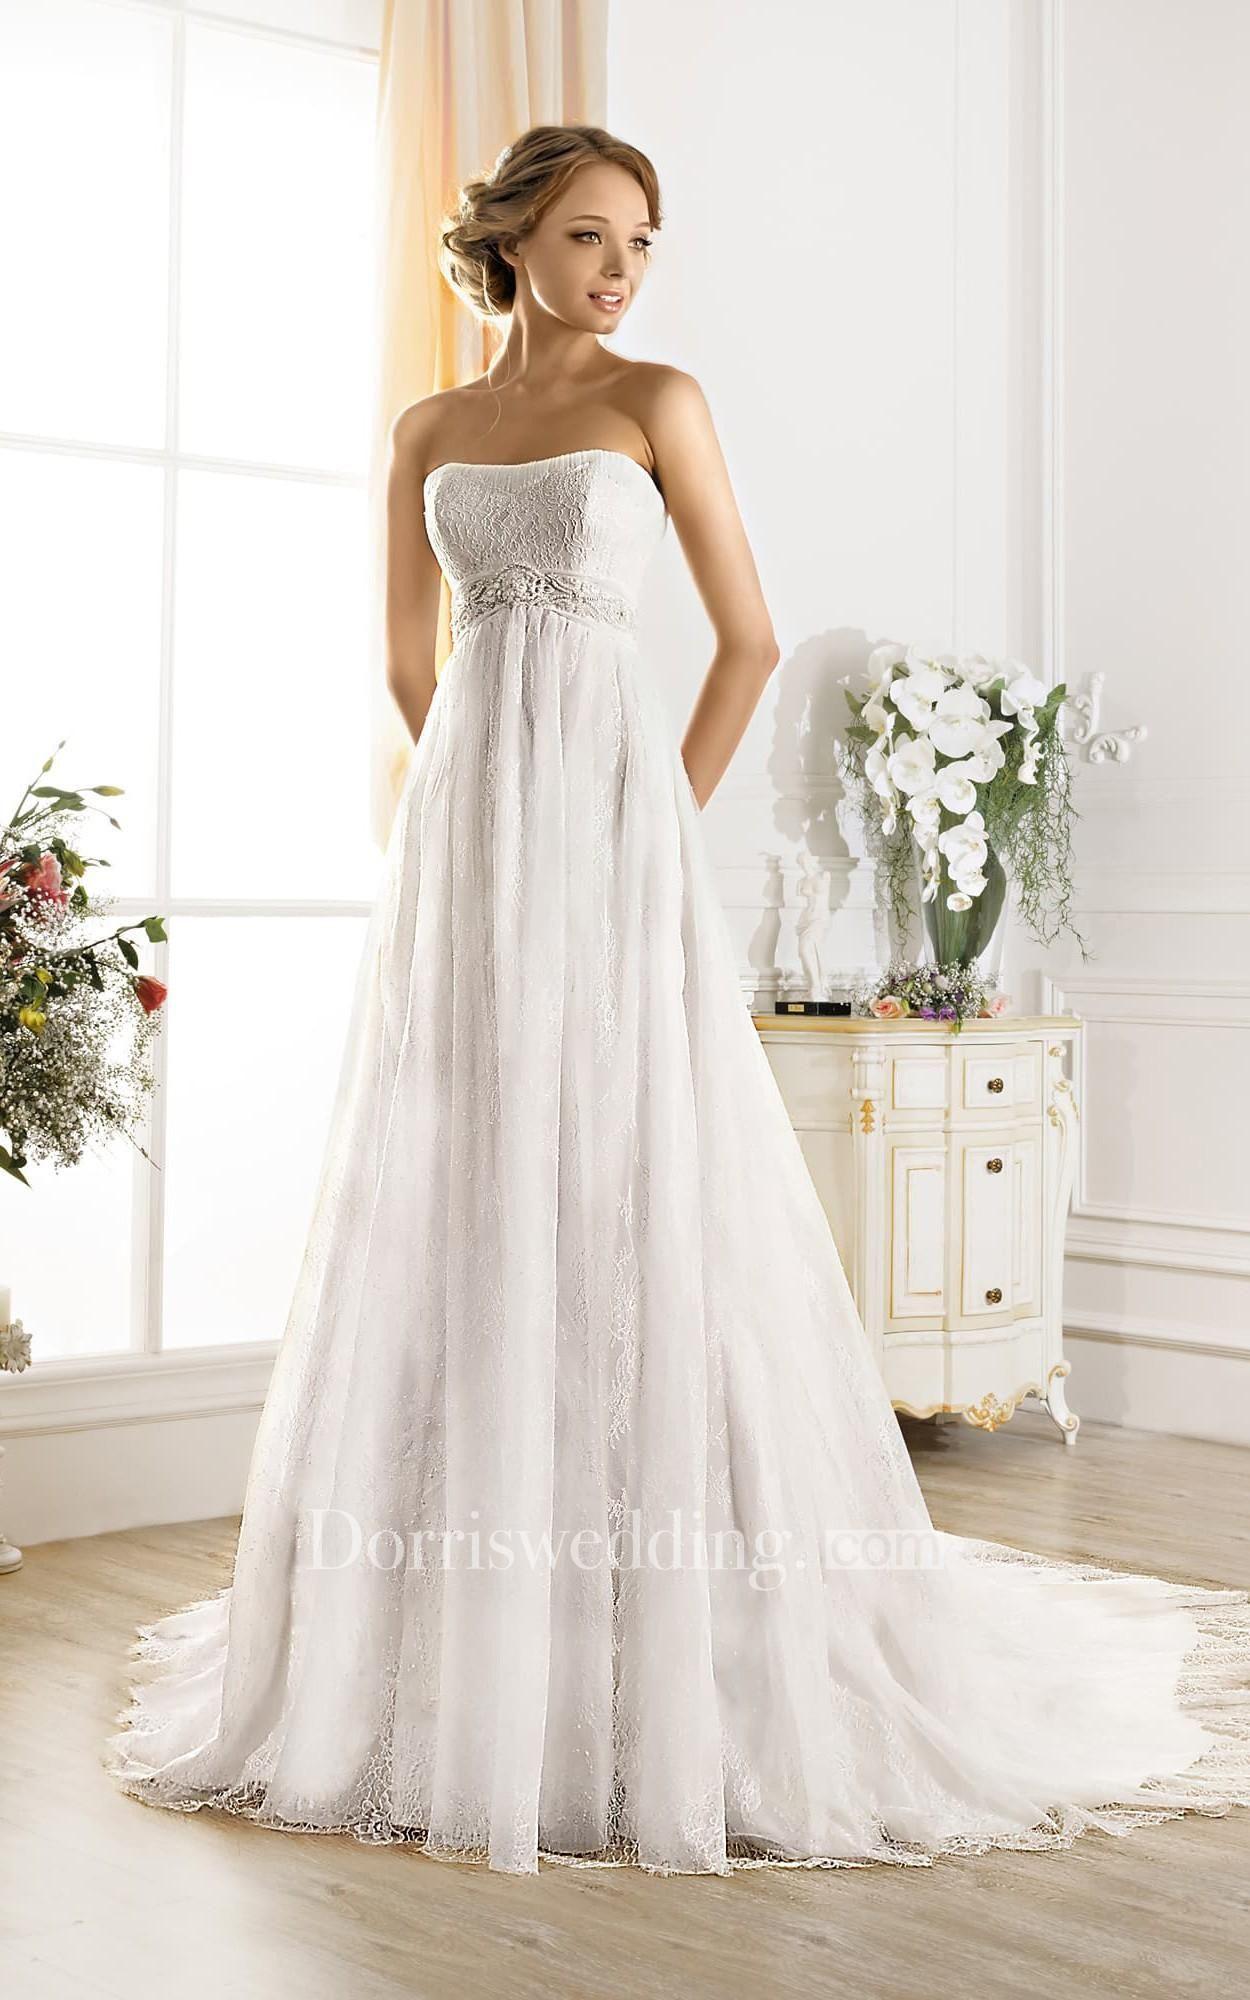 Dorris wedding dorris wedding aline maxi strapless sleeveless